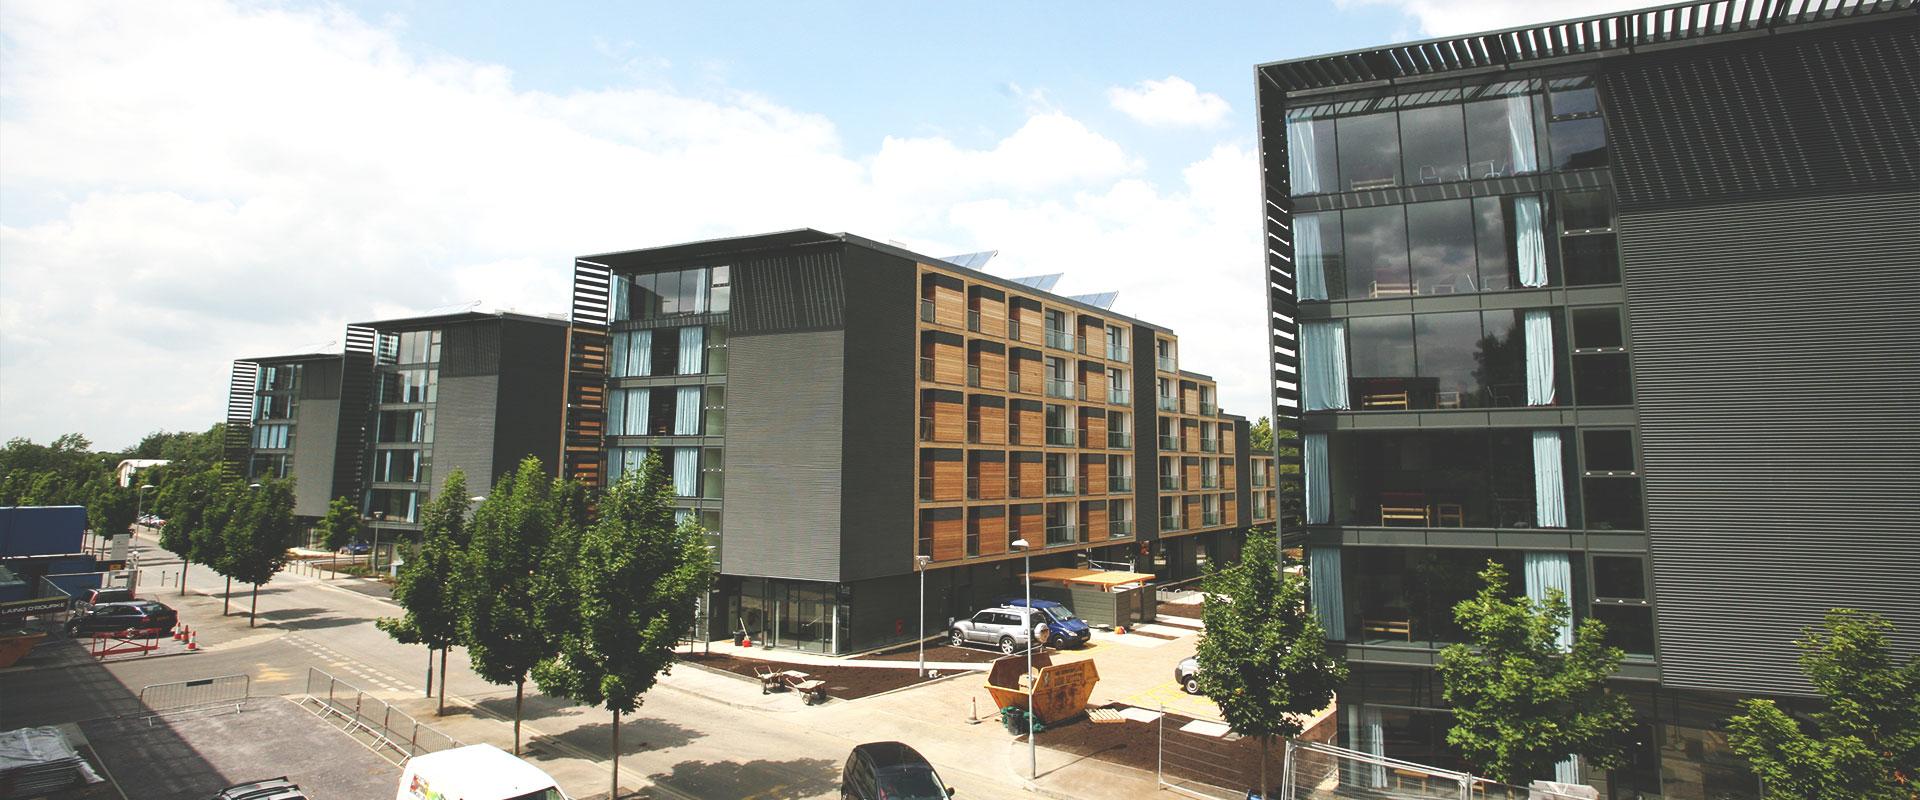 Addenbrookes Hospital Project